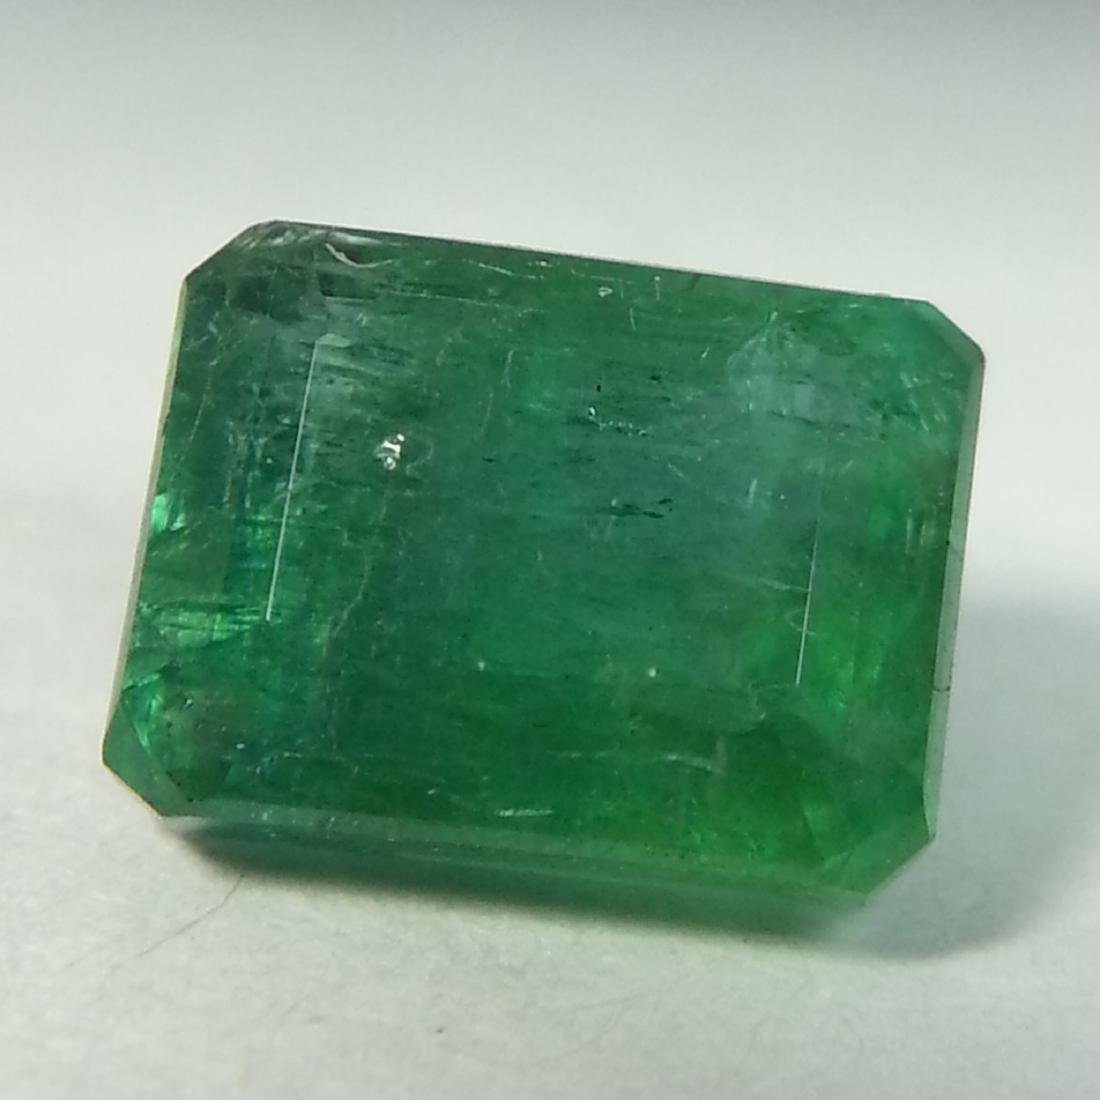 Emerald - 2.46 ct